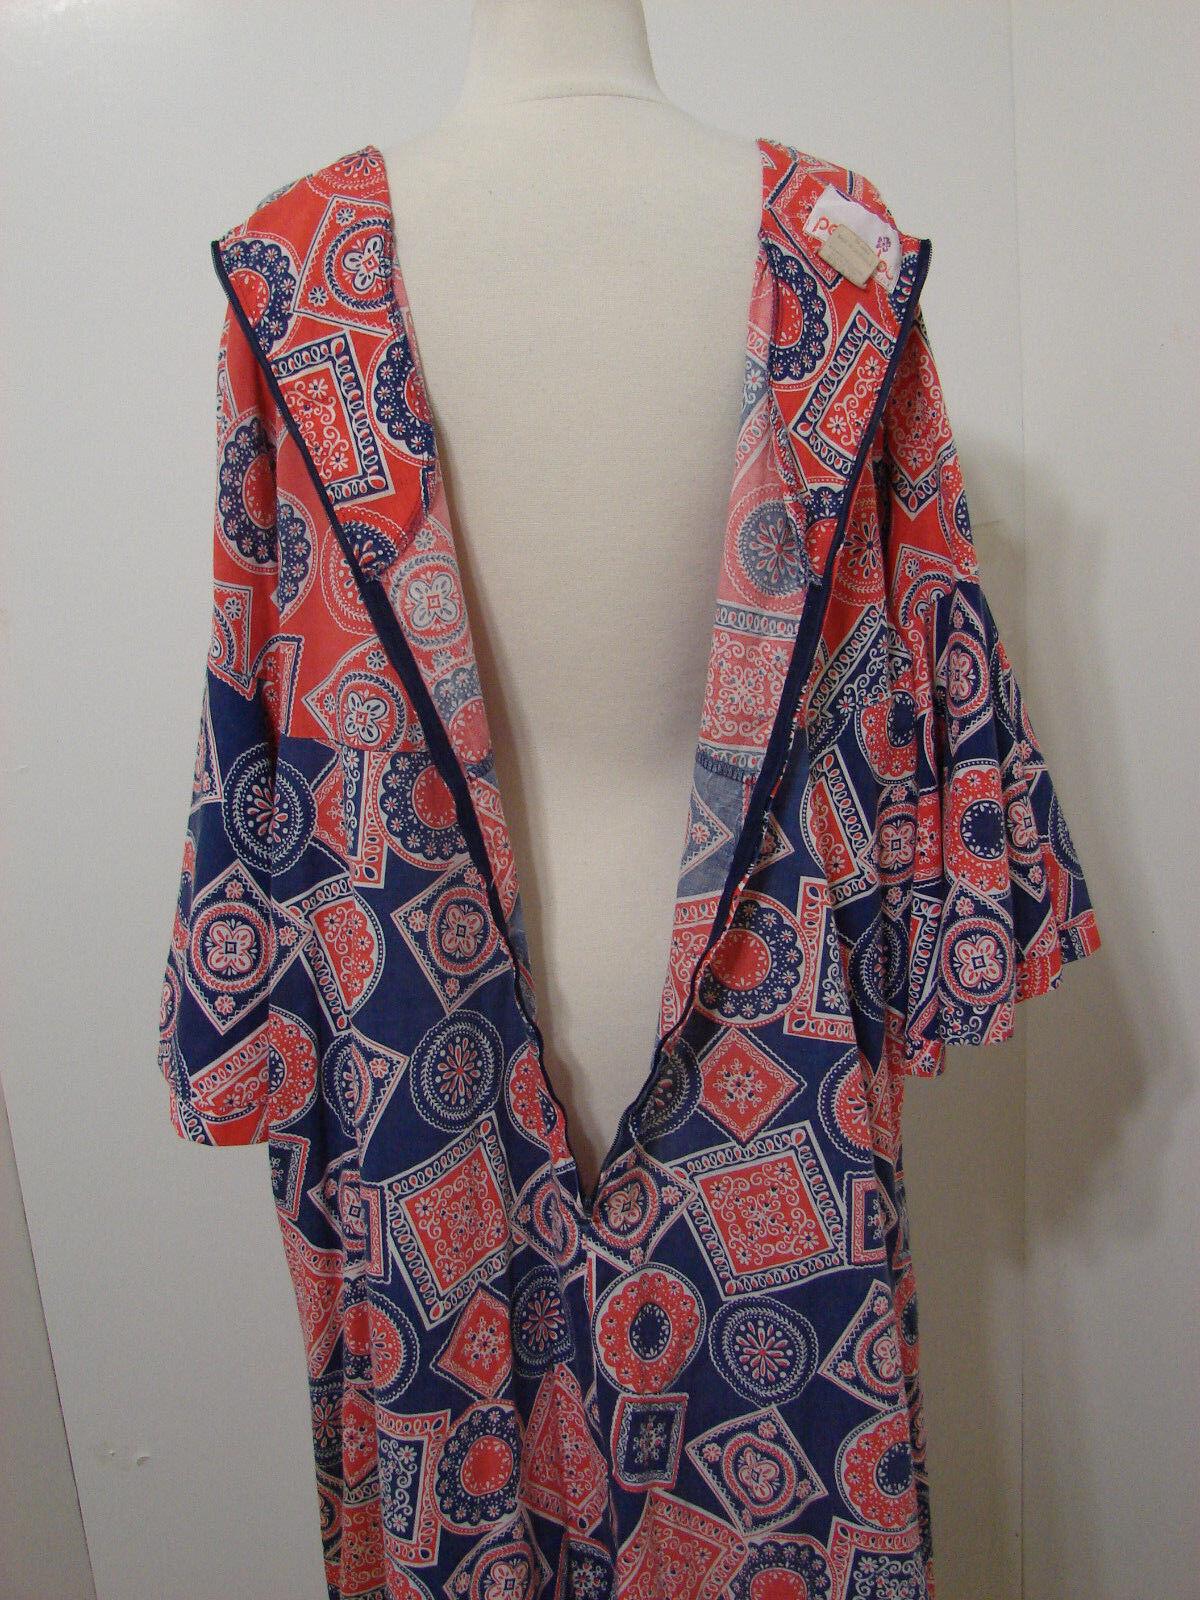 PEGGY LOU Caftan Dress Vintage 1960's Groovy Patc… - image 8